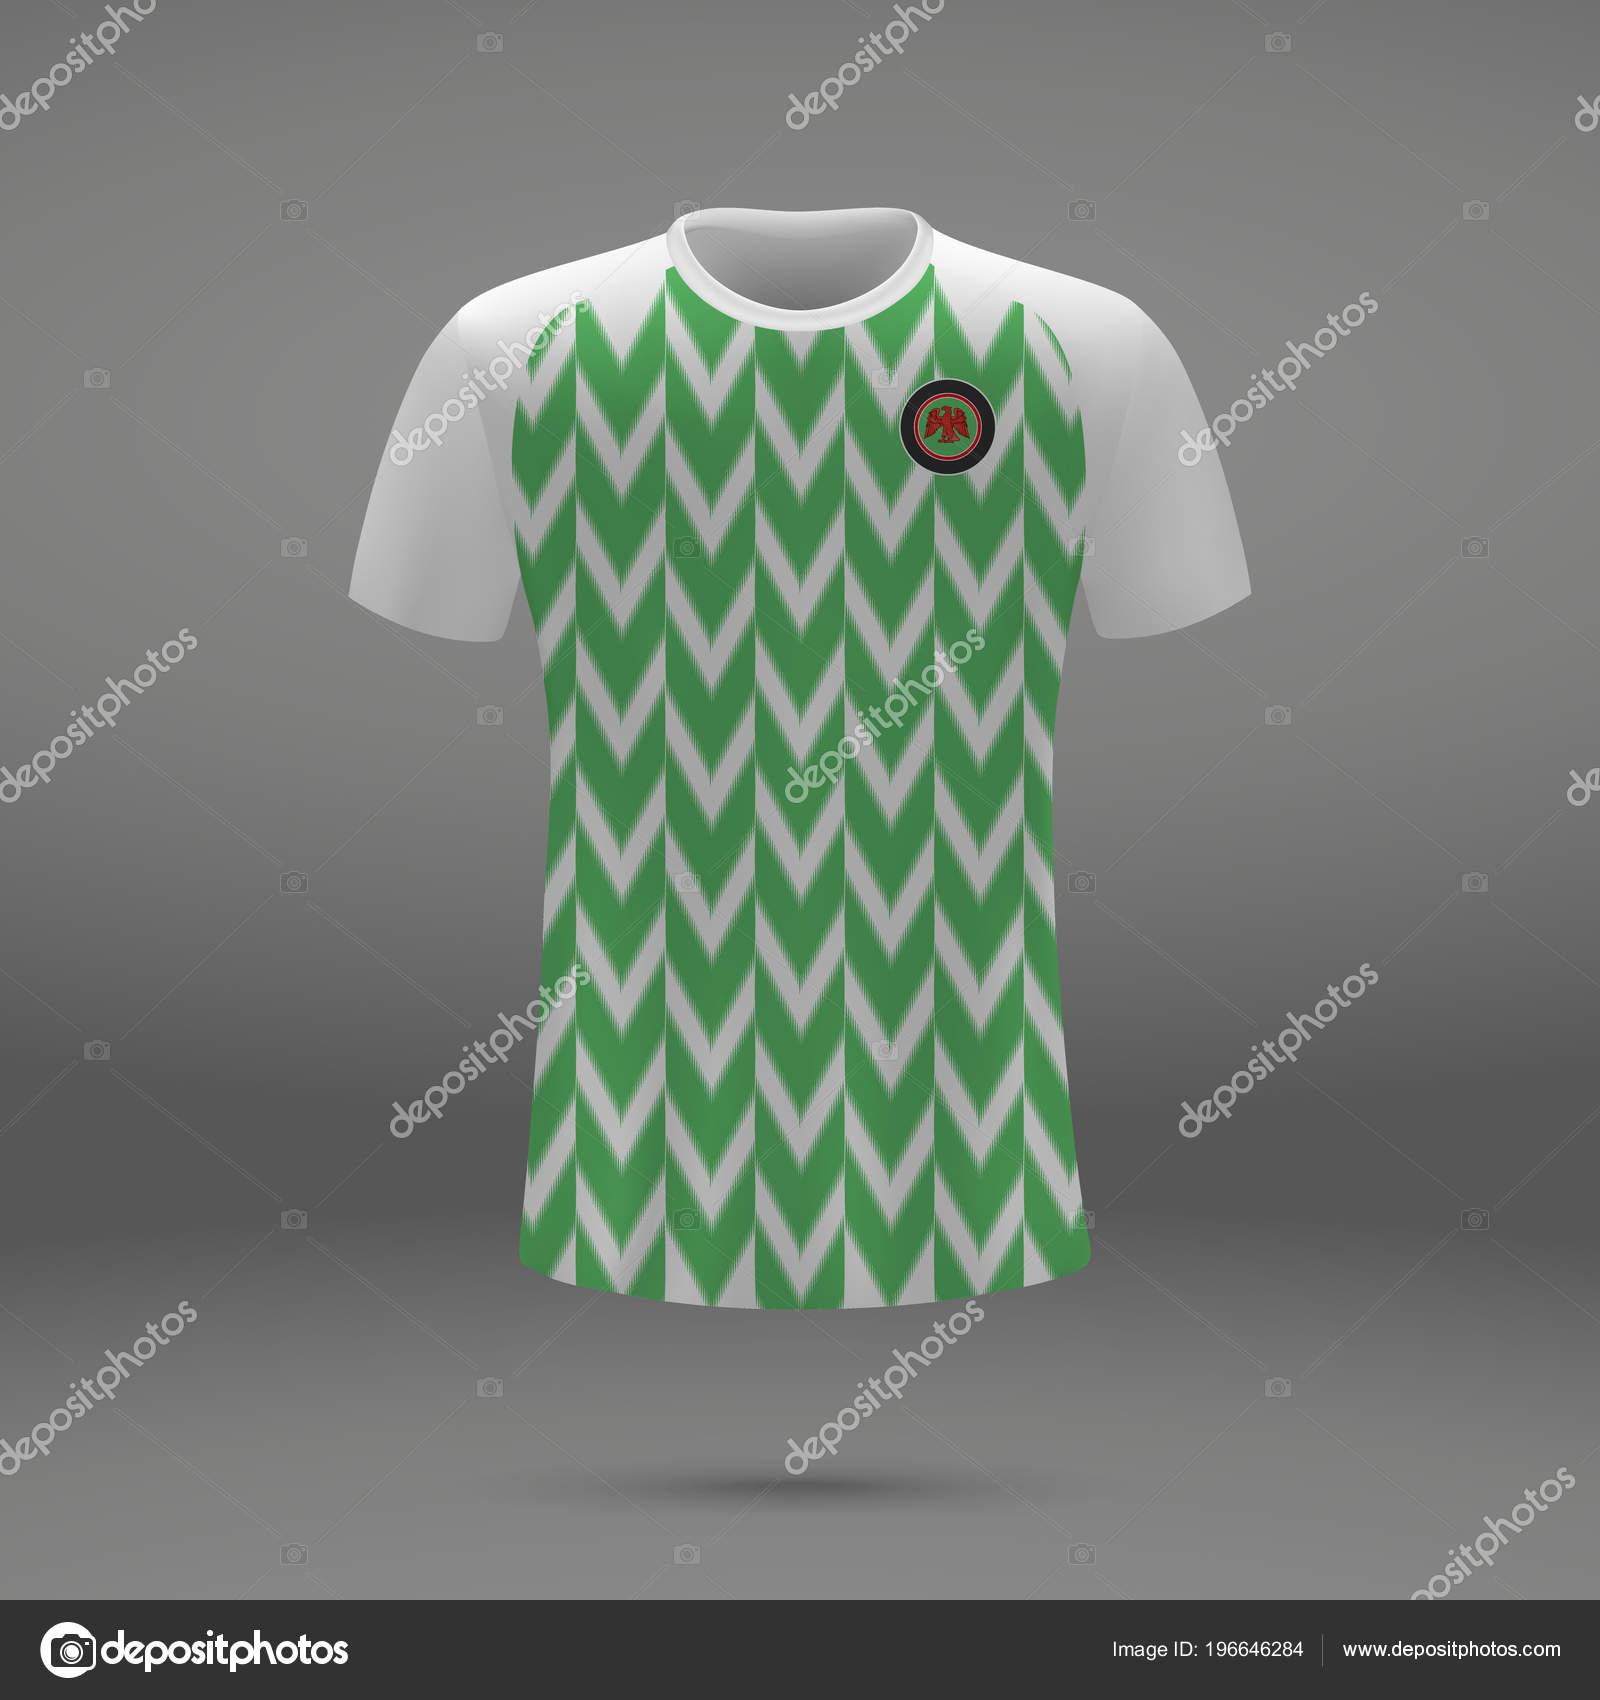 c03416c72 Football Kit Nigeria 2018 Shirt Template Soccer Jersey Vector ...